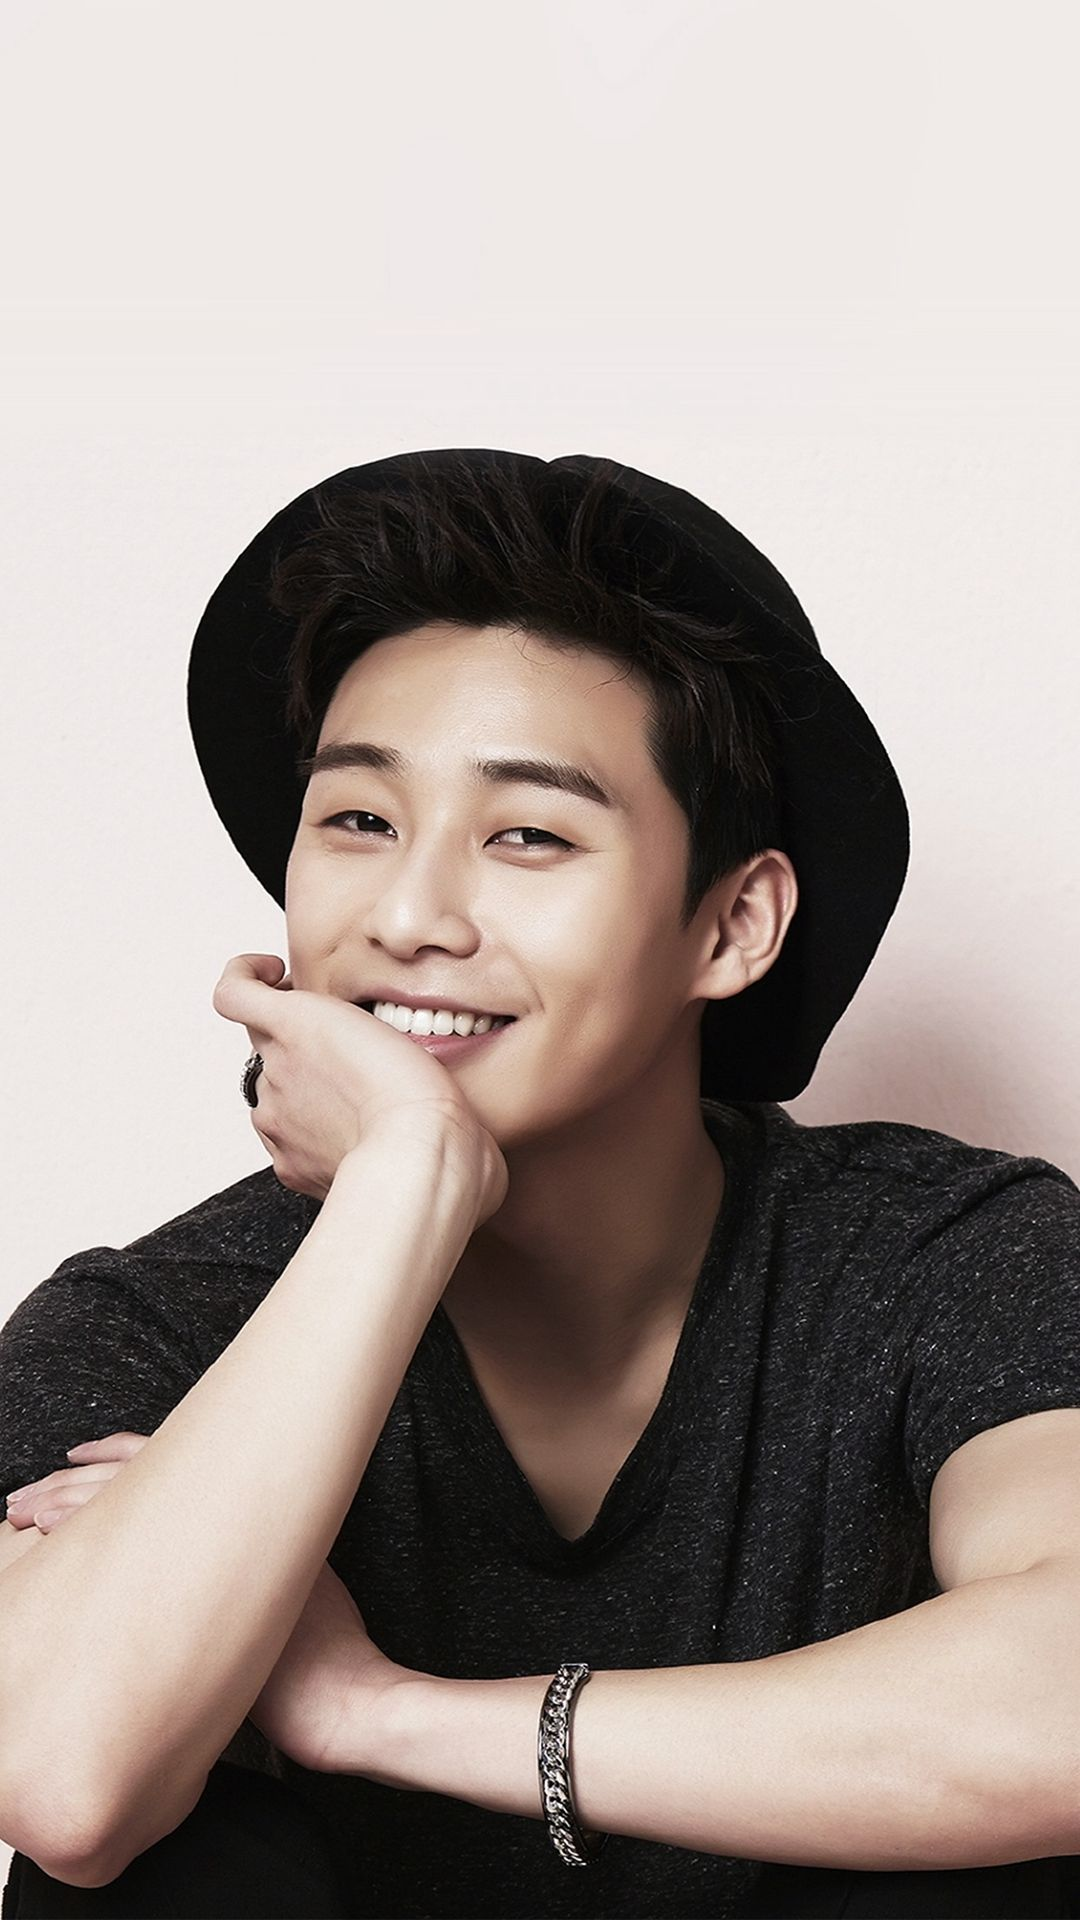 Park Seo Joon Kpop Handsome Cool Guy Iphone 6 Wallpaper Download Iphone Wallpapers Ipad Wallpapers One Stop Download Seo Joon Park Seo Jun Joon Park